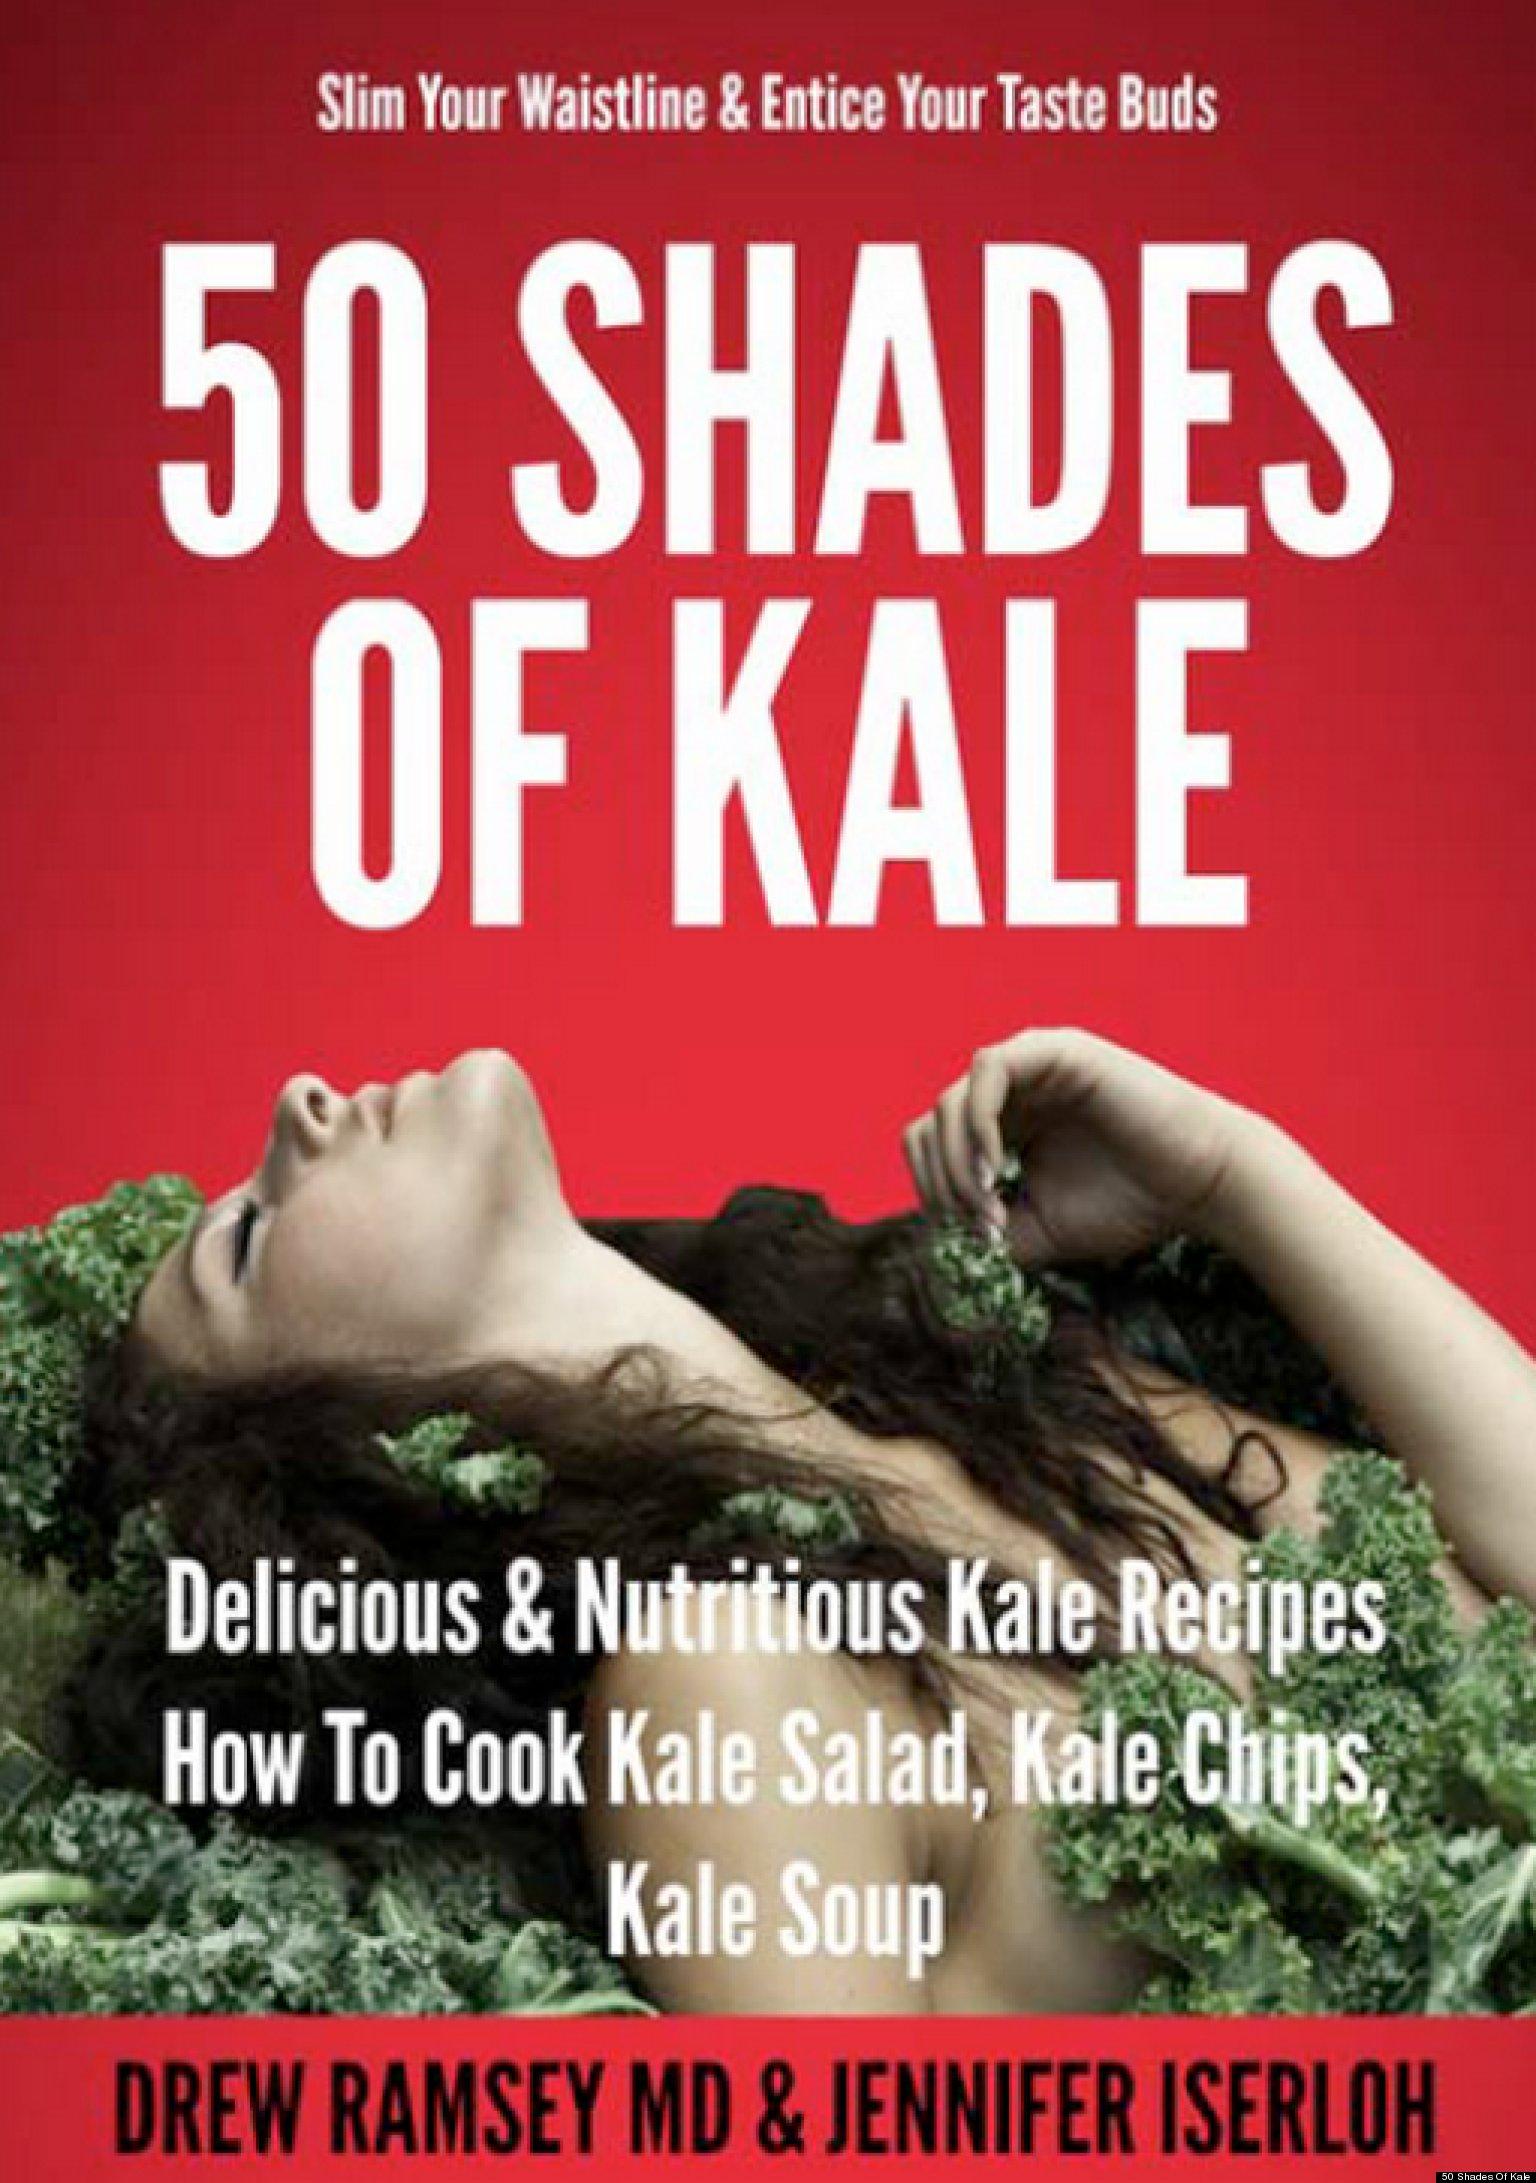 Let Kale Be Kale